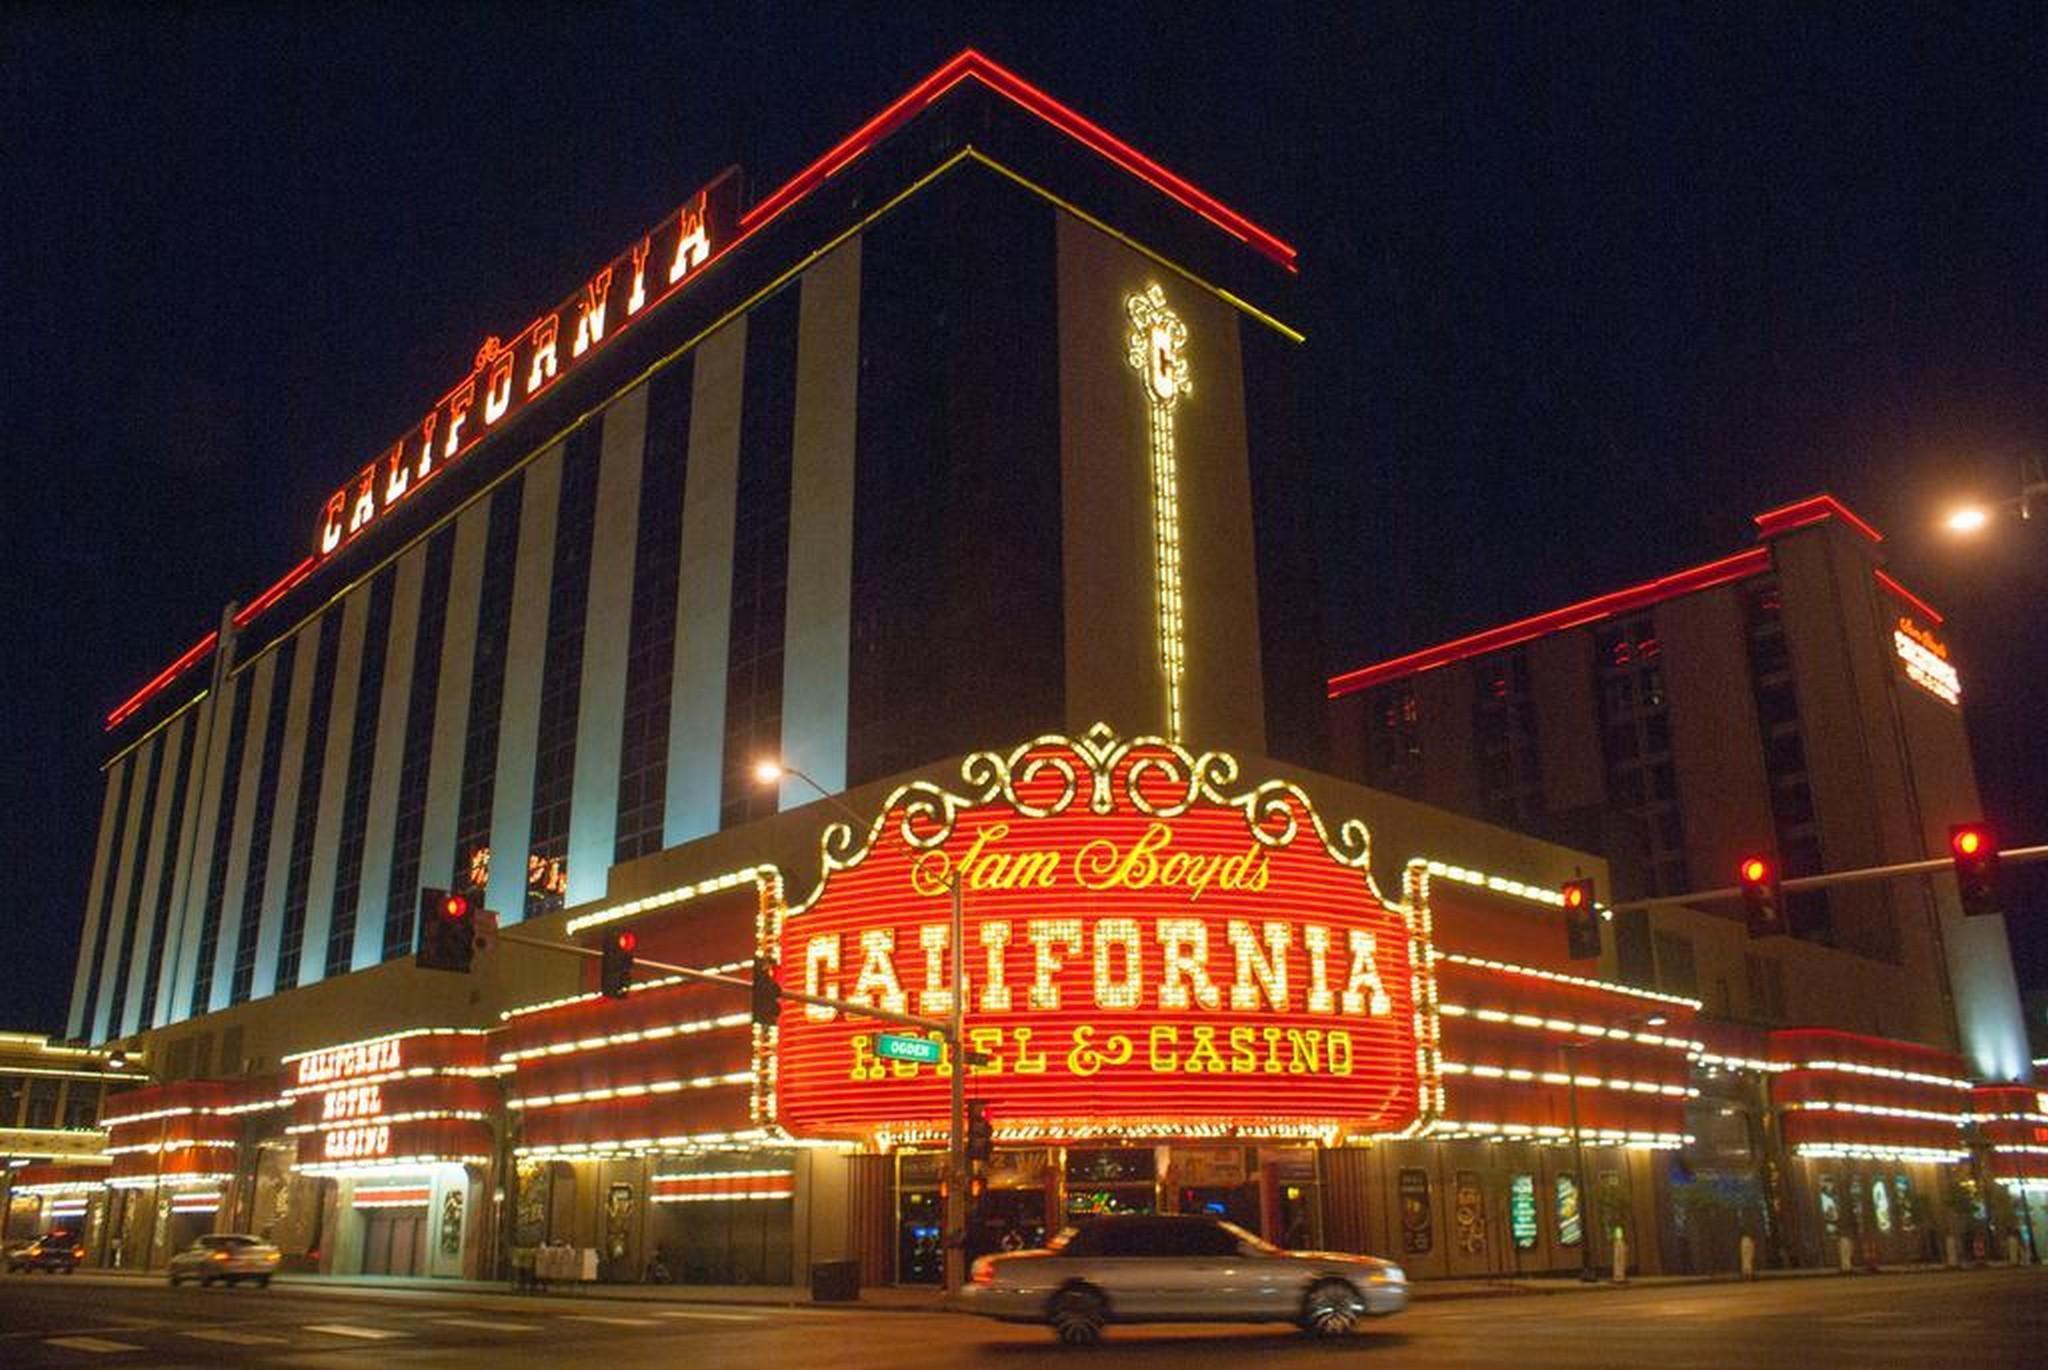 Casino and hotel in california anti gambling campaigns